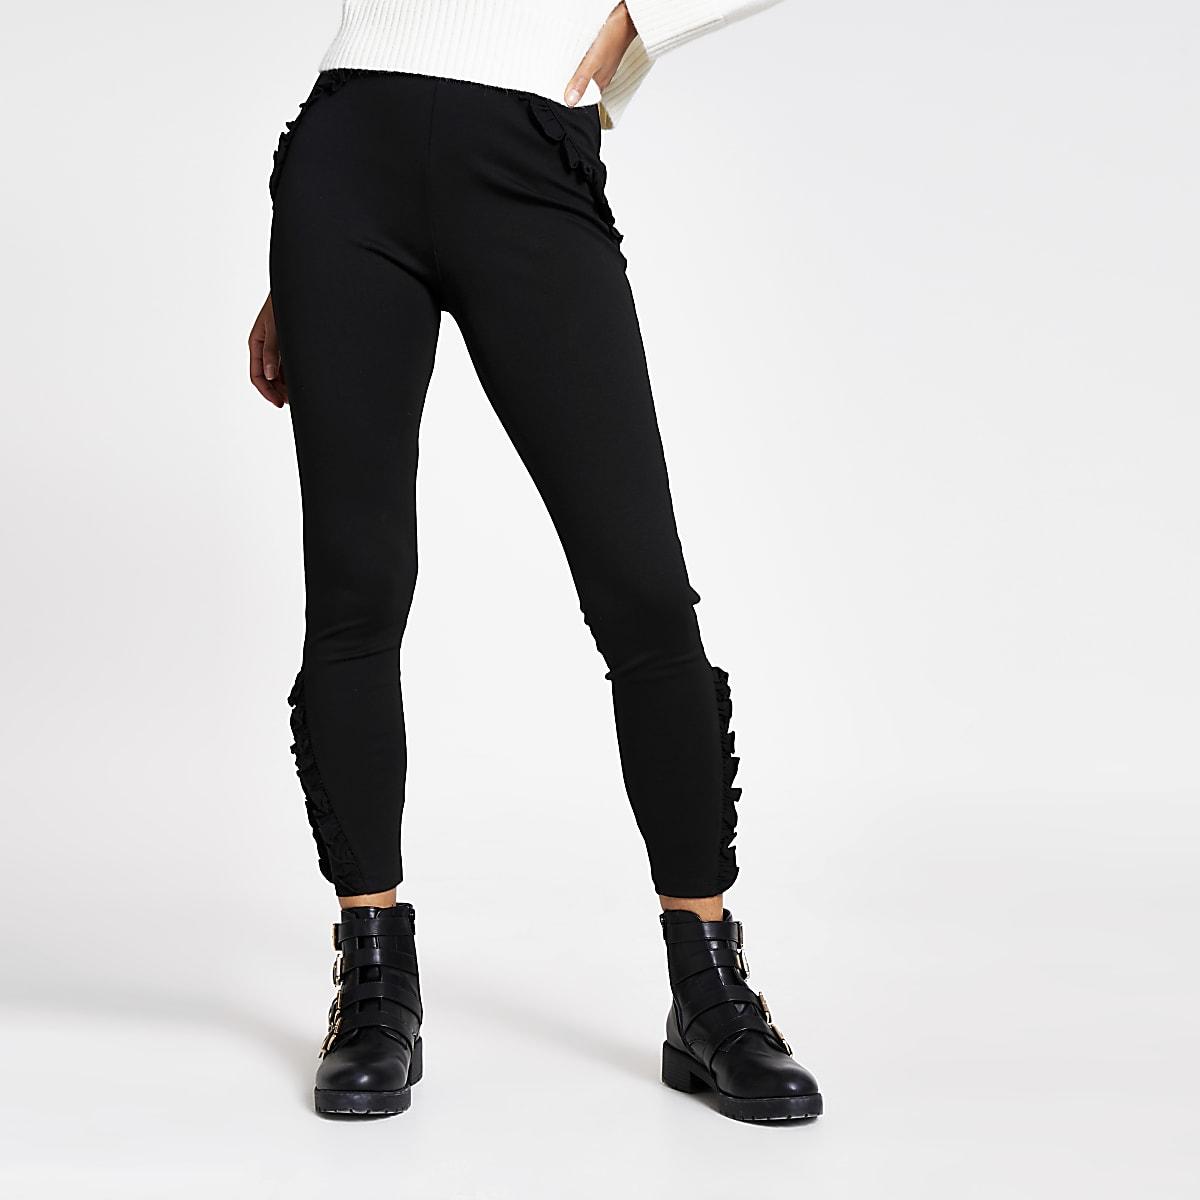 Black frill mesh trim ponte leggings